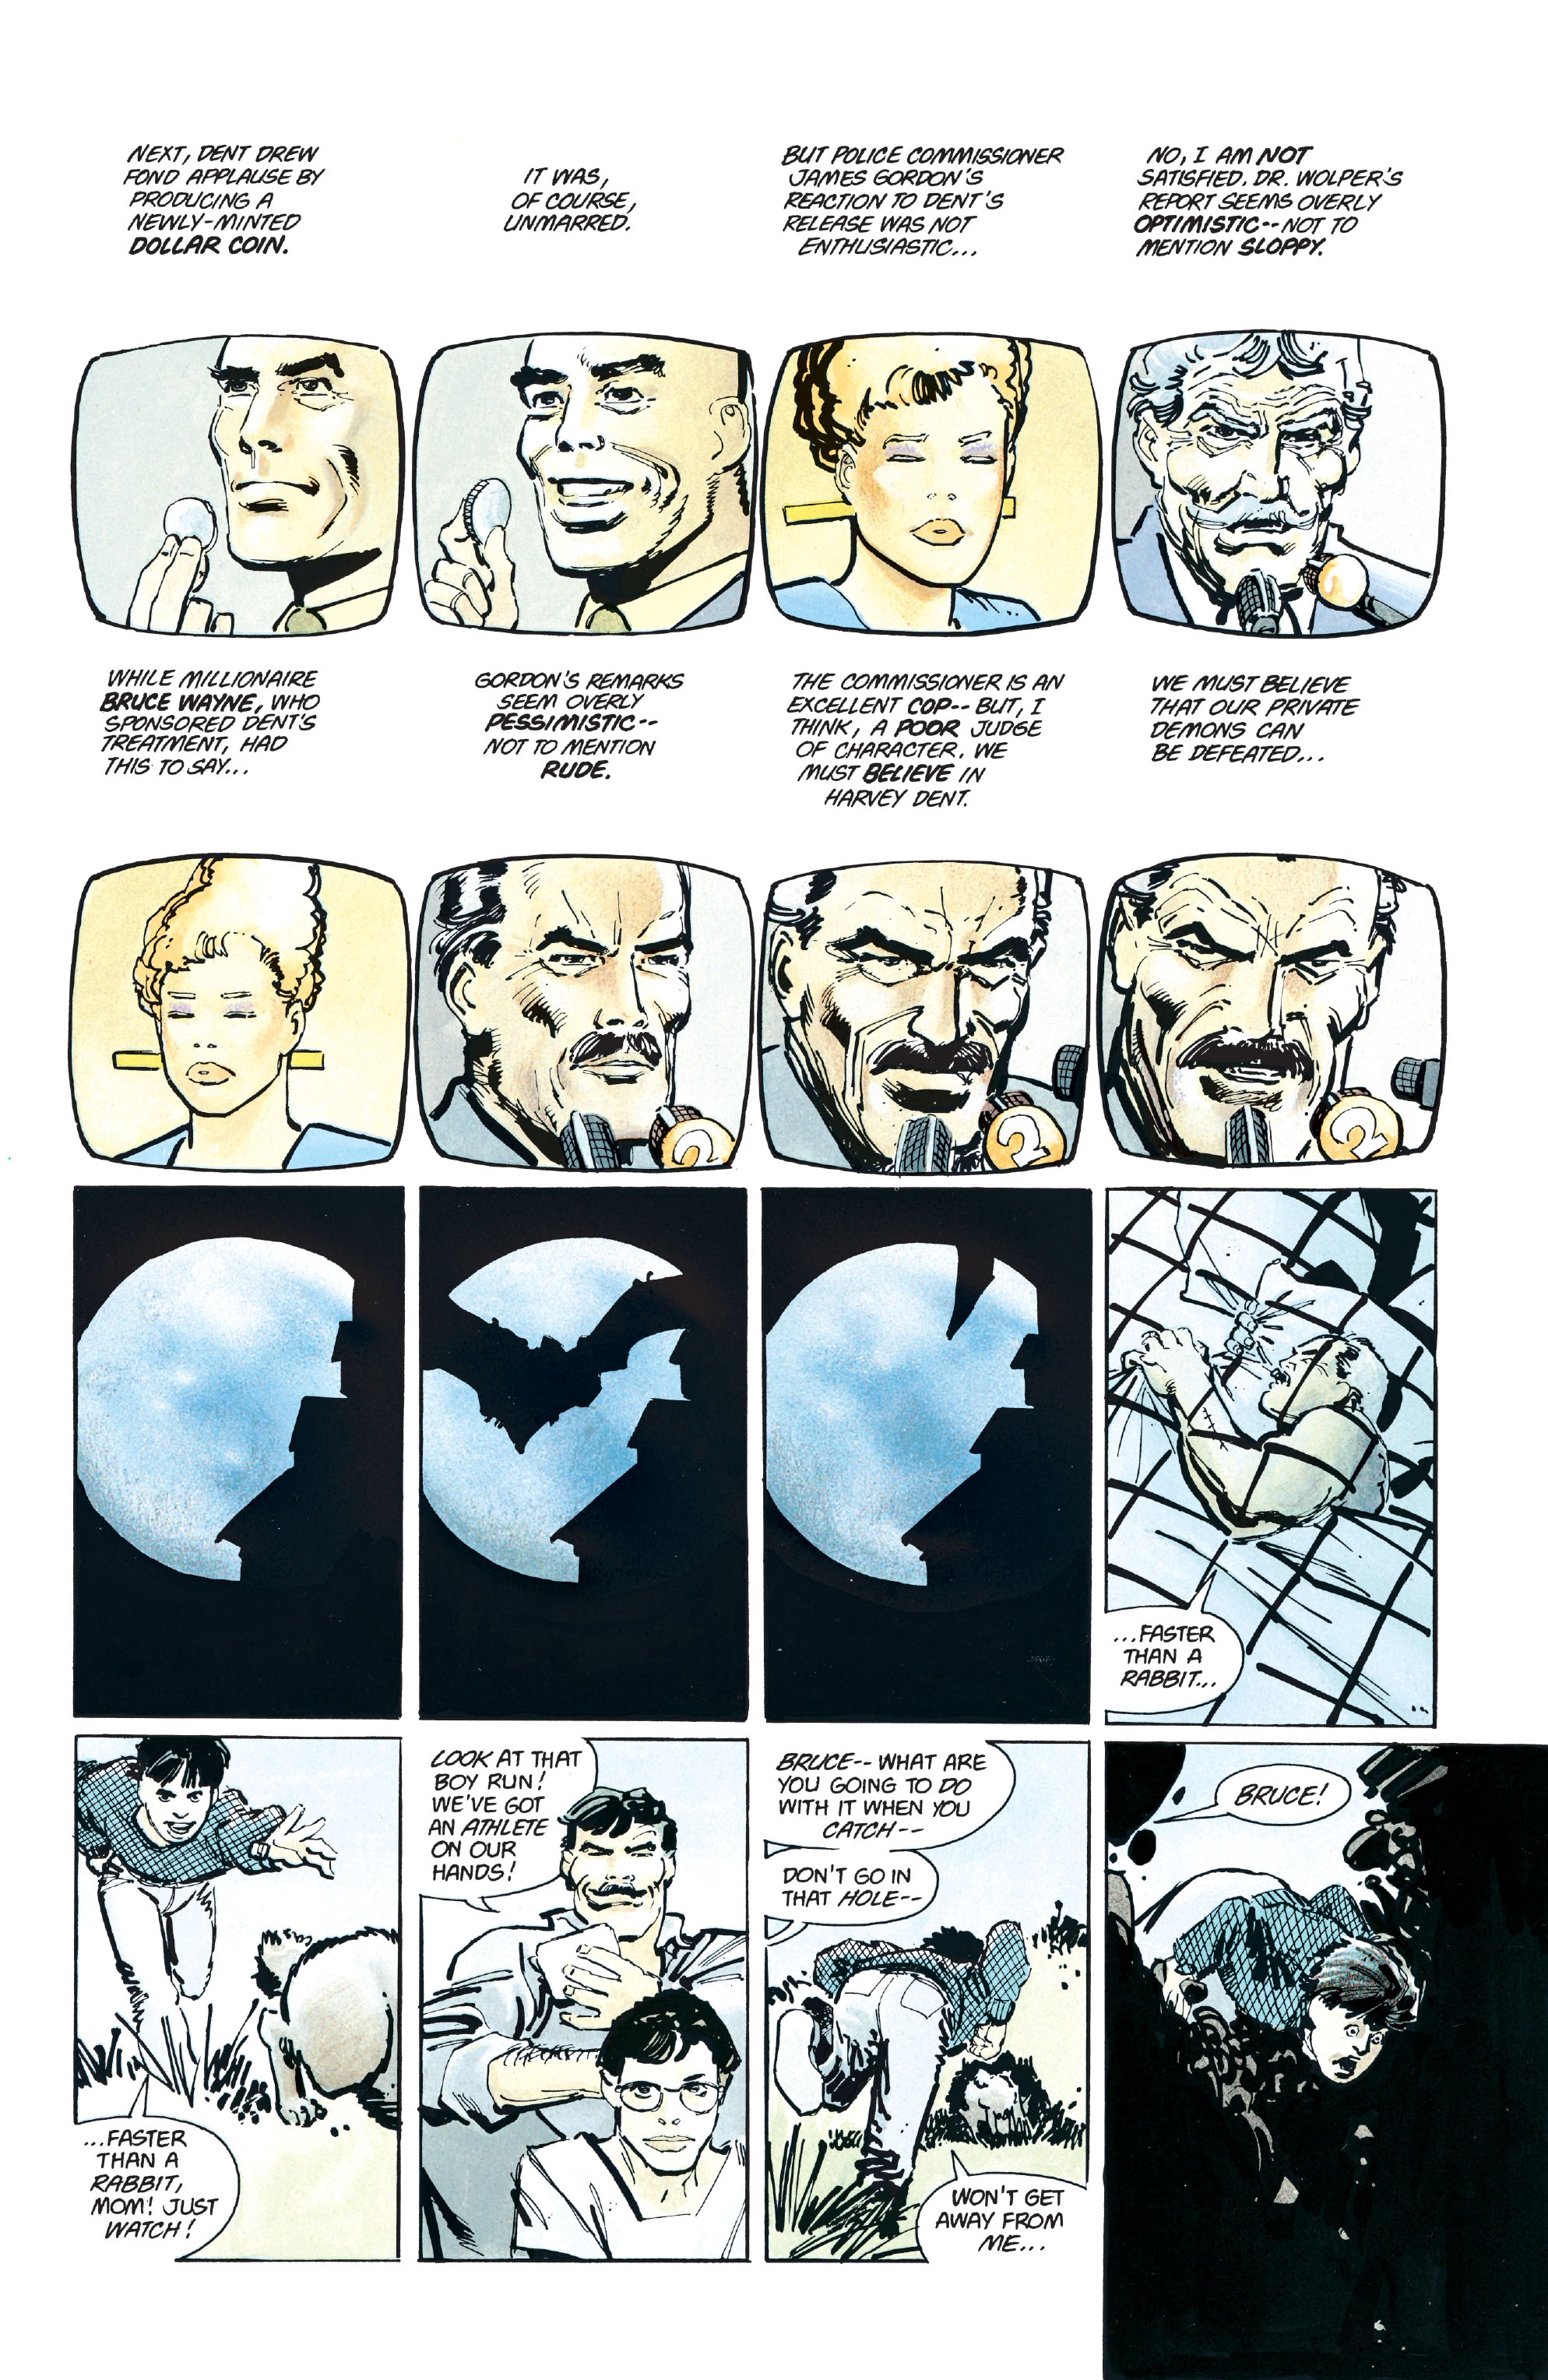 Psychology of Bruce Wayne X3IKXsv5WCOFVnUaQVhTPDVjoj1S2vZ_nqf0vpfr8isurijuyv1OgUpCNfSh05D-JiTKnJpE9ikd=s0